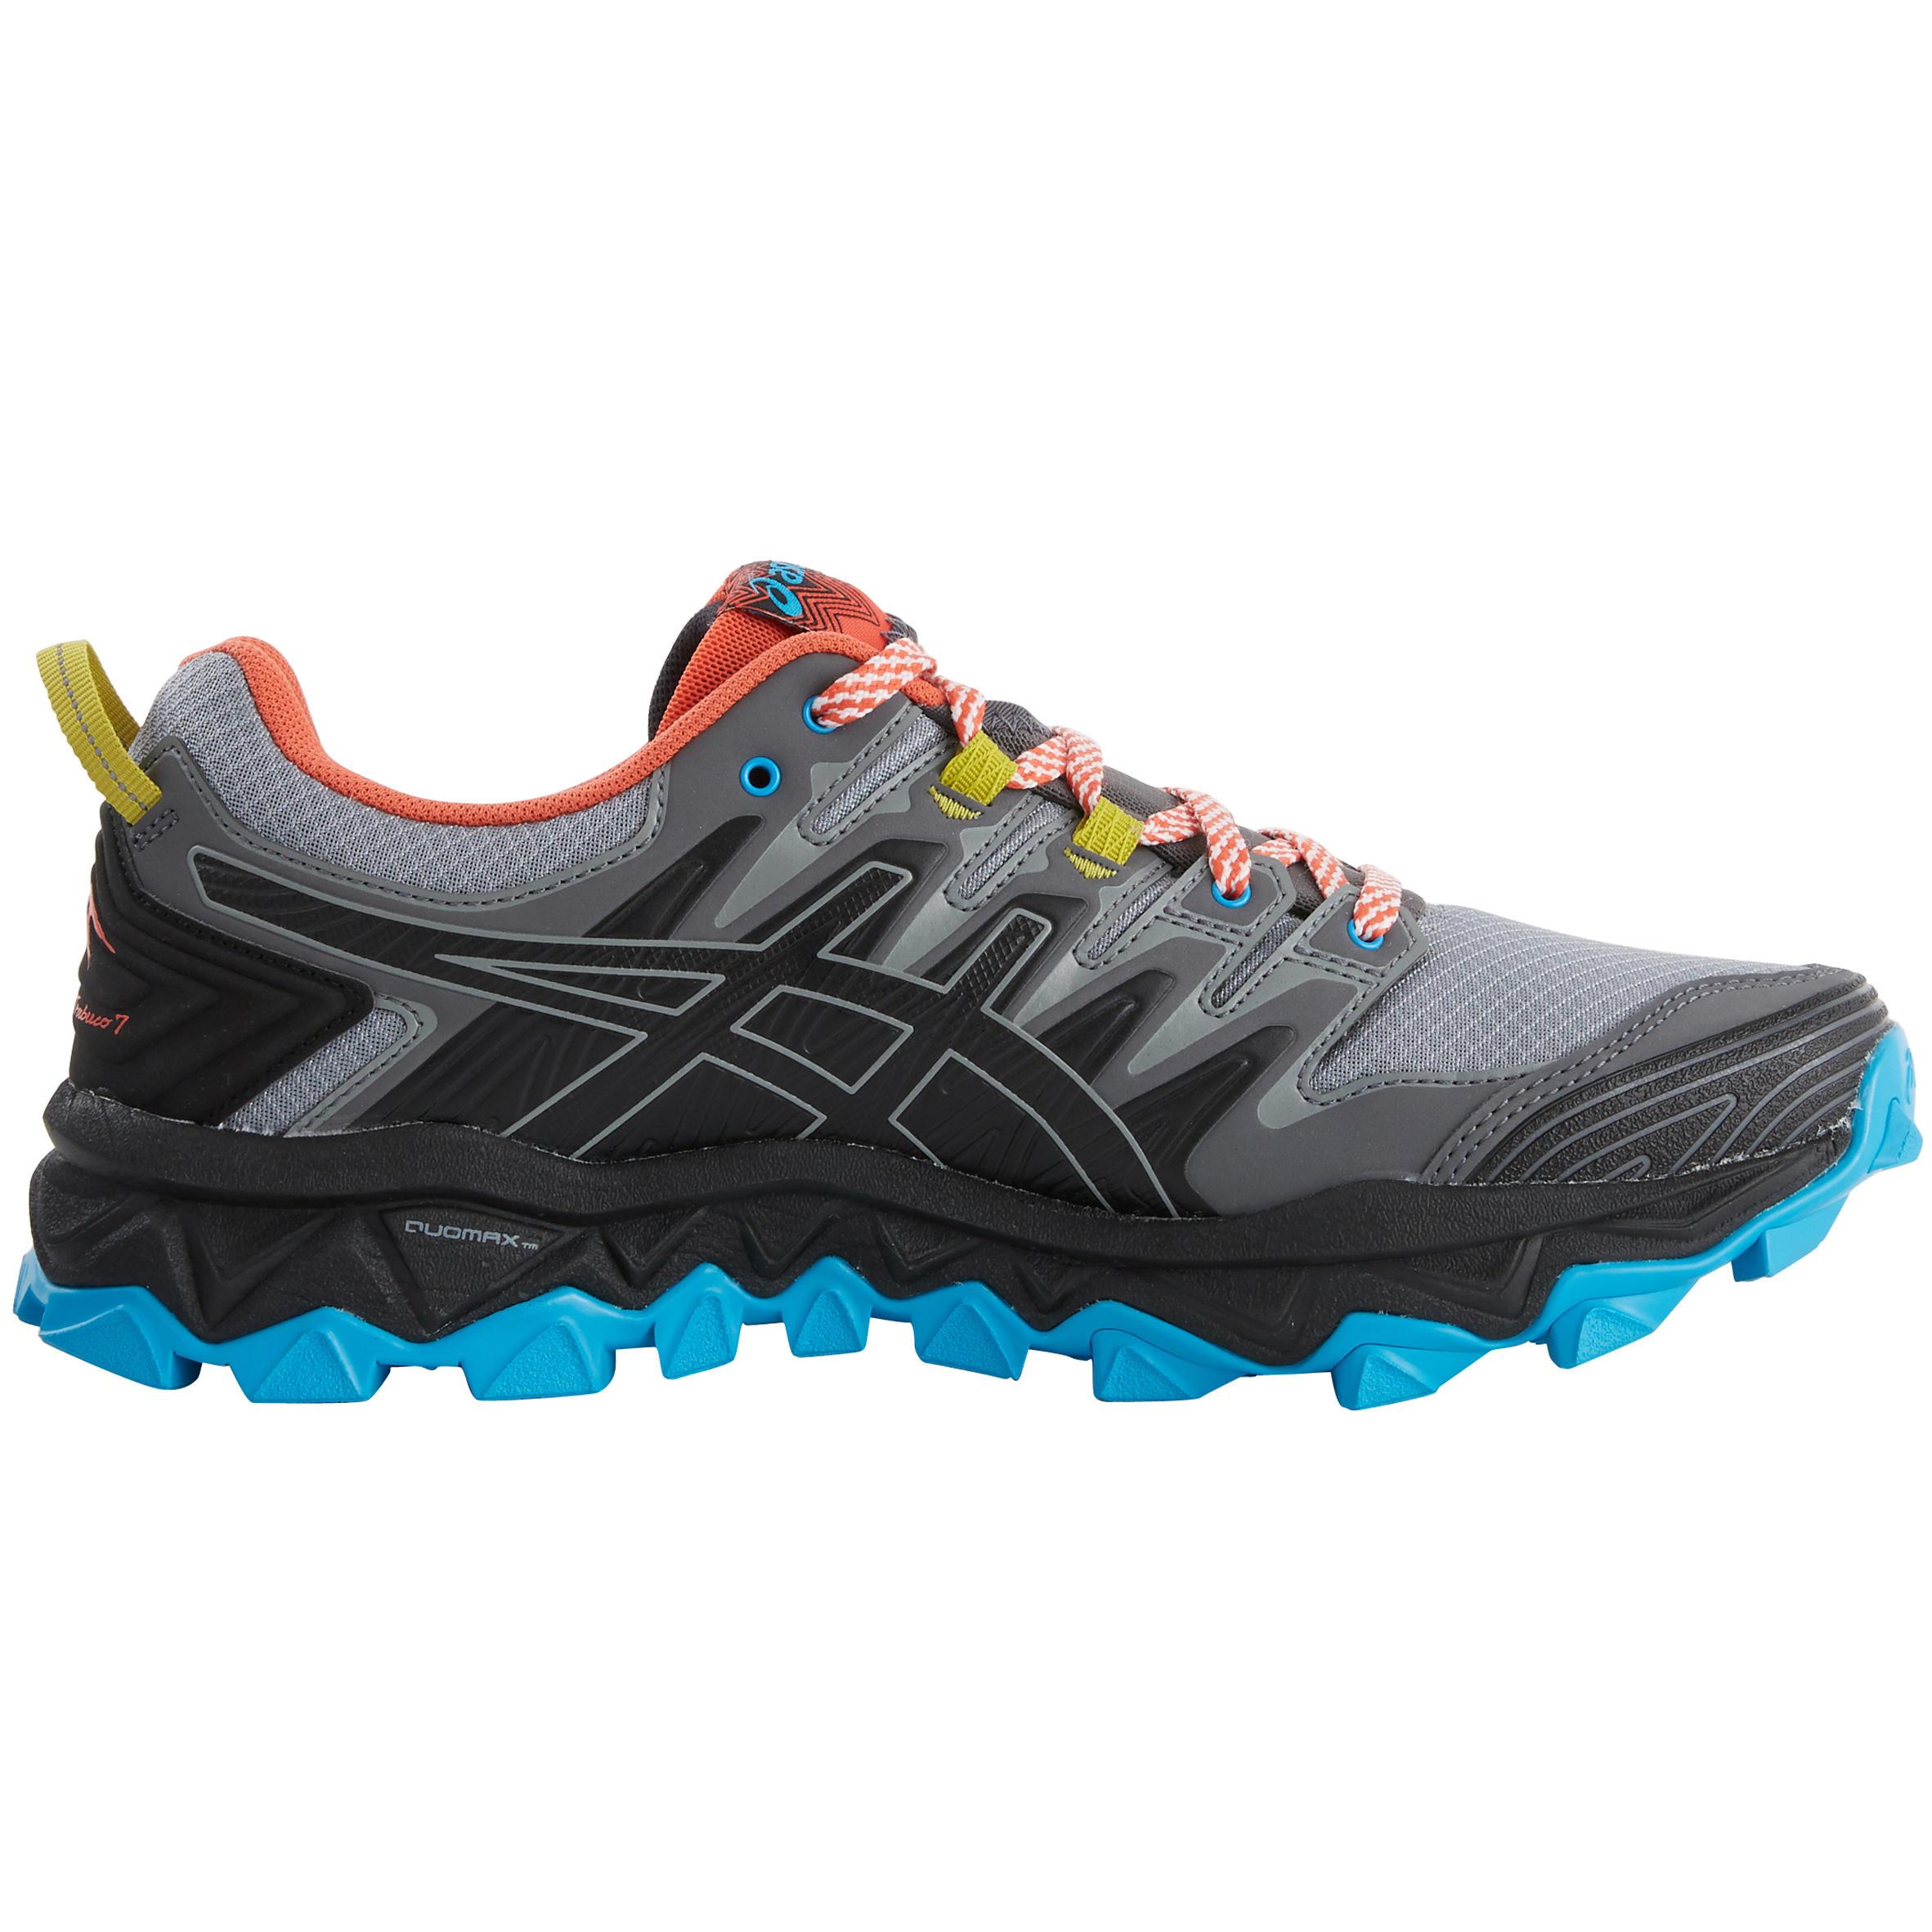 b7c981f8d7a996 Laufschuhe Trail Gel Fujitrabuco 7 Herren grau blau